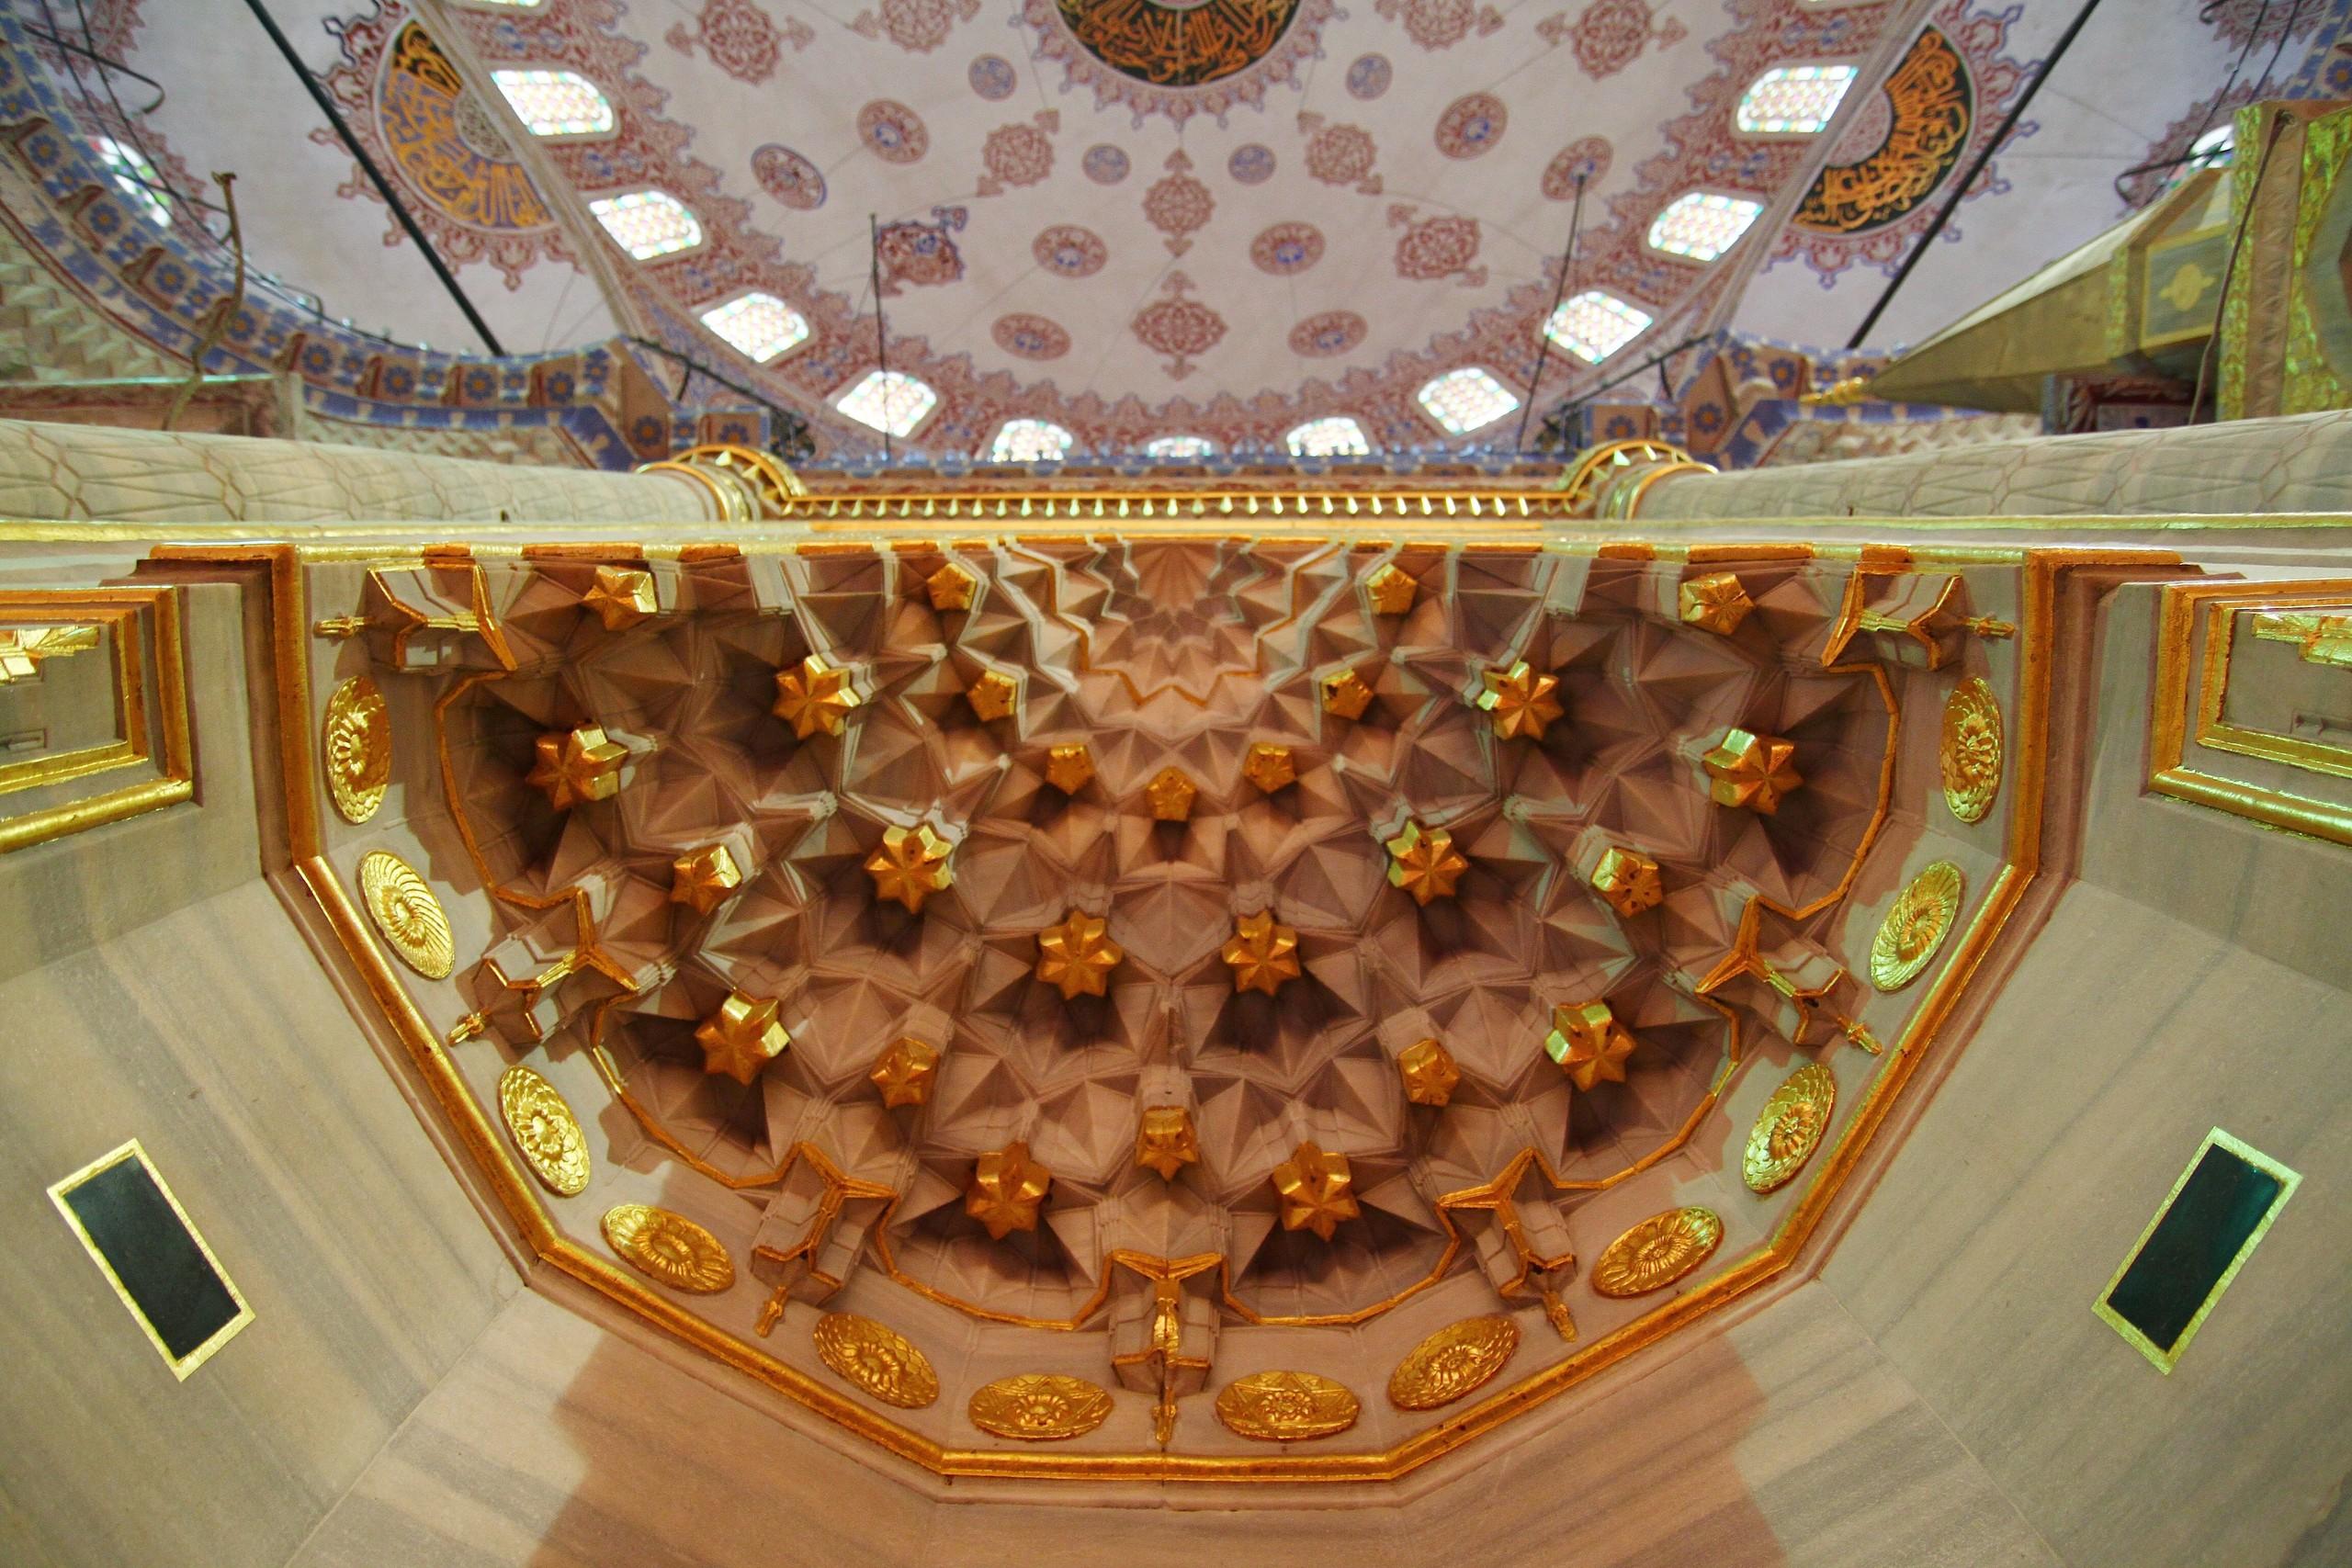 Pırlantadan Kubbeler #5: Sultanahmed - o7q4n7 - Pırlantadan Kubbeler #5: Sultanahmed